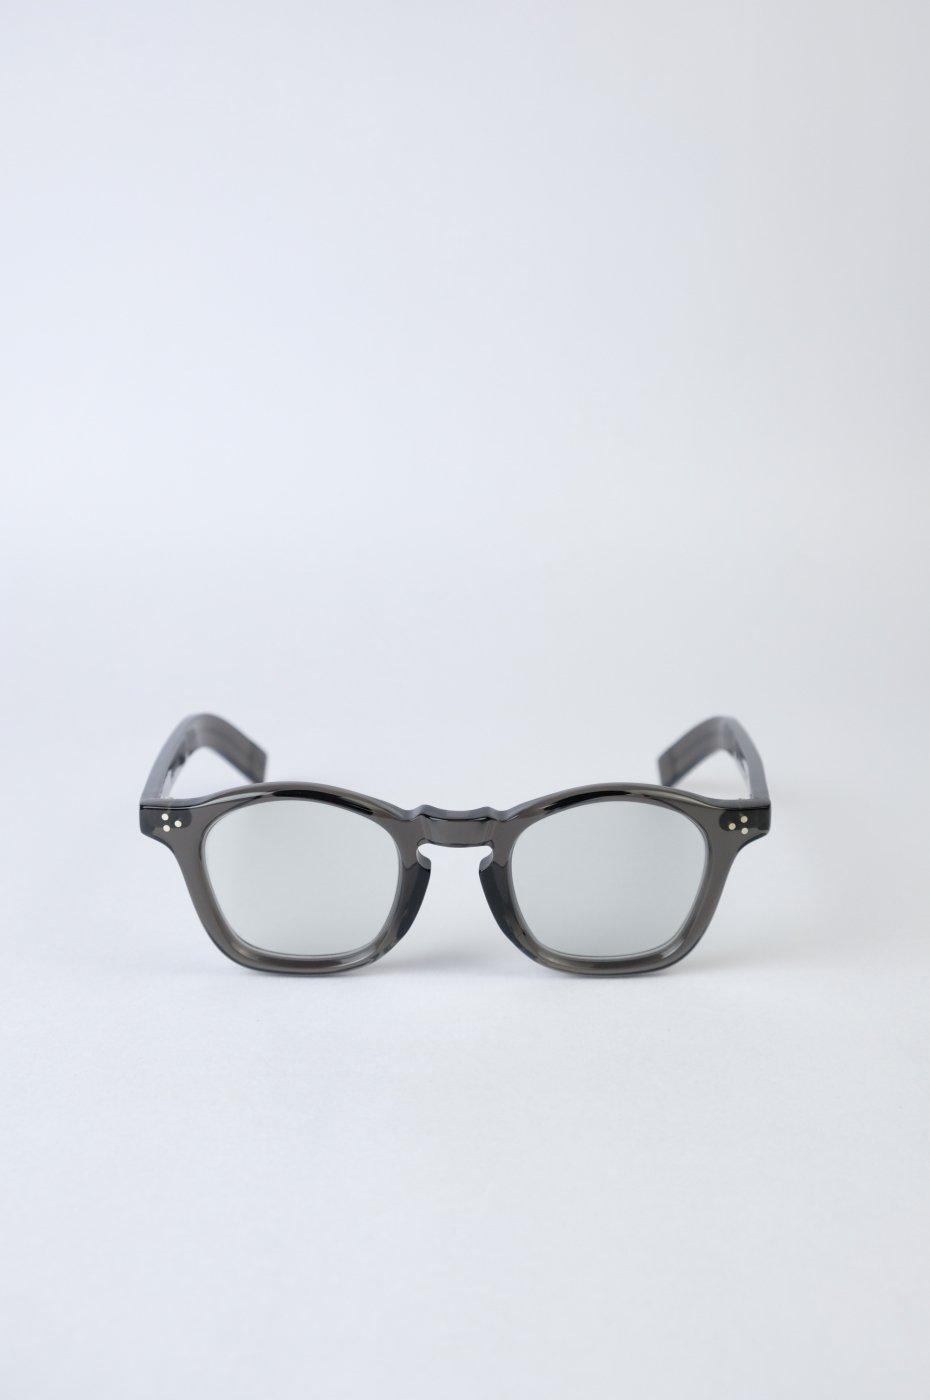 guépard ギュパール-gp-05-Gray-Green Lens-